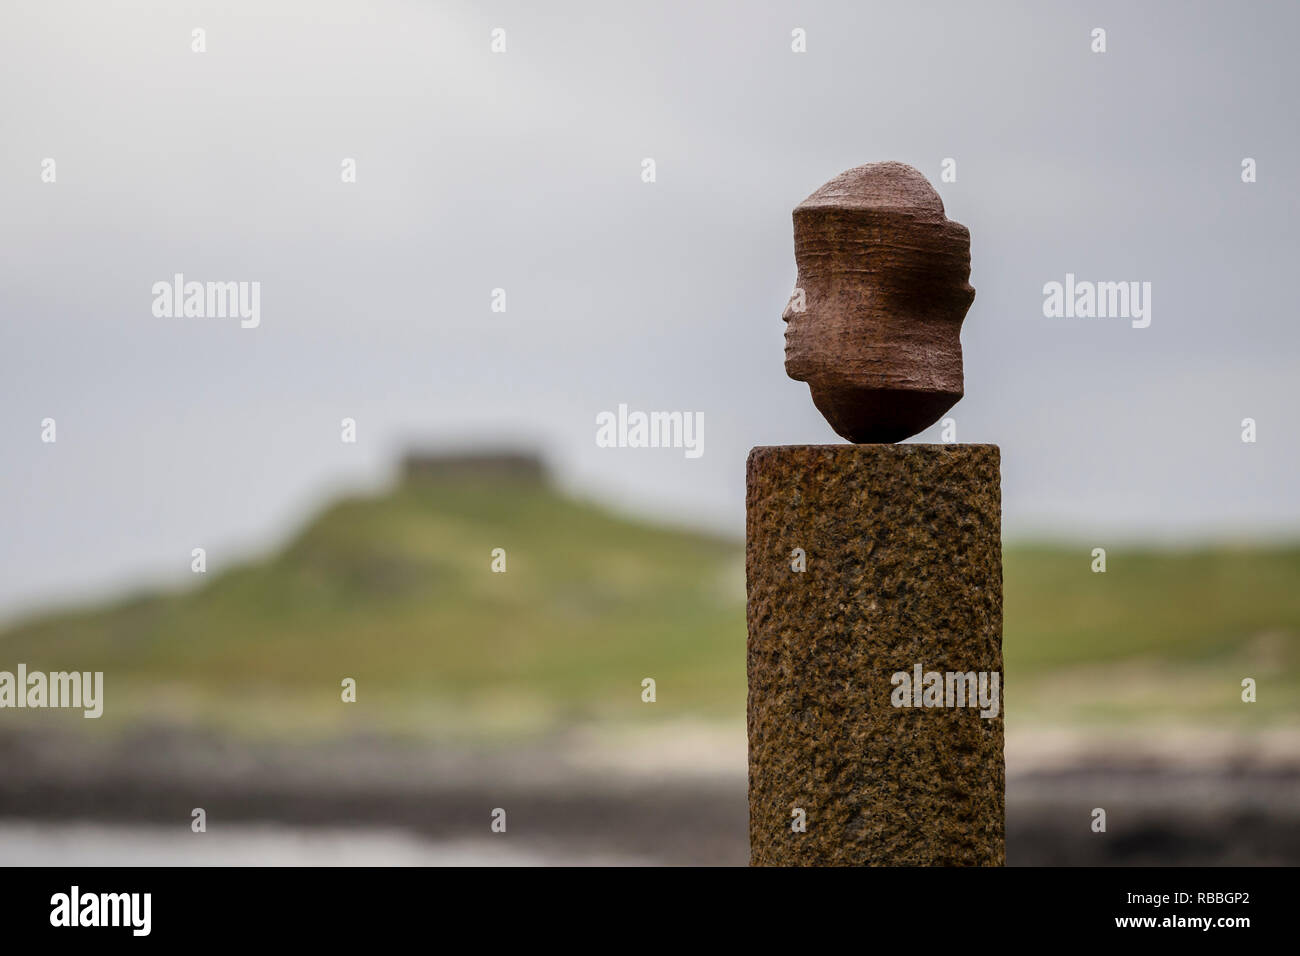 Eggum, 'the head', sculpture at the beach near Eggum, part of Artscape Nordland, Skulpturlandskap Nordland, Vestvagöy, Lofoten, Norway - Stock Image